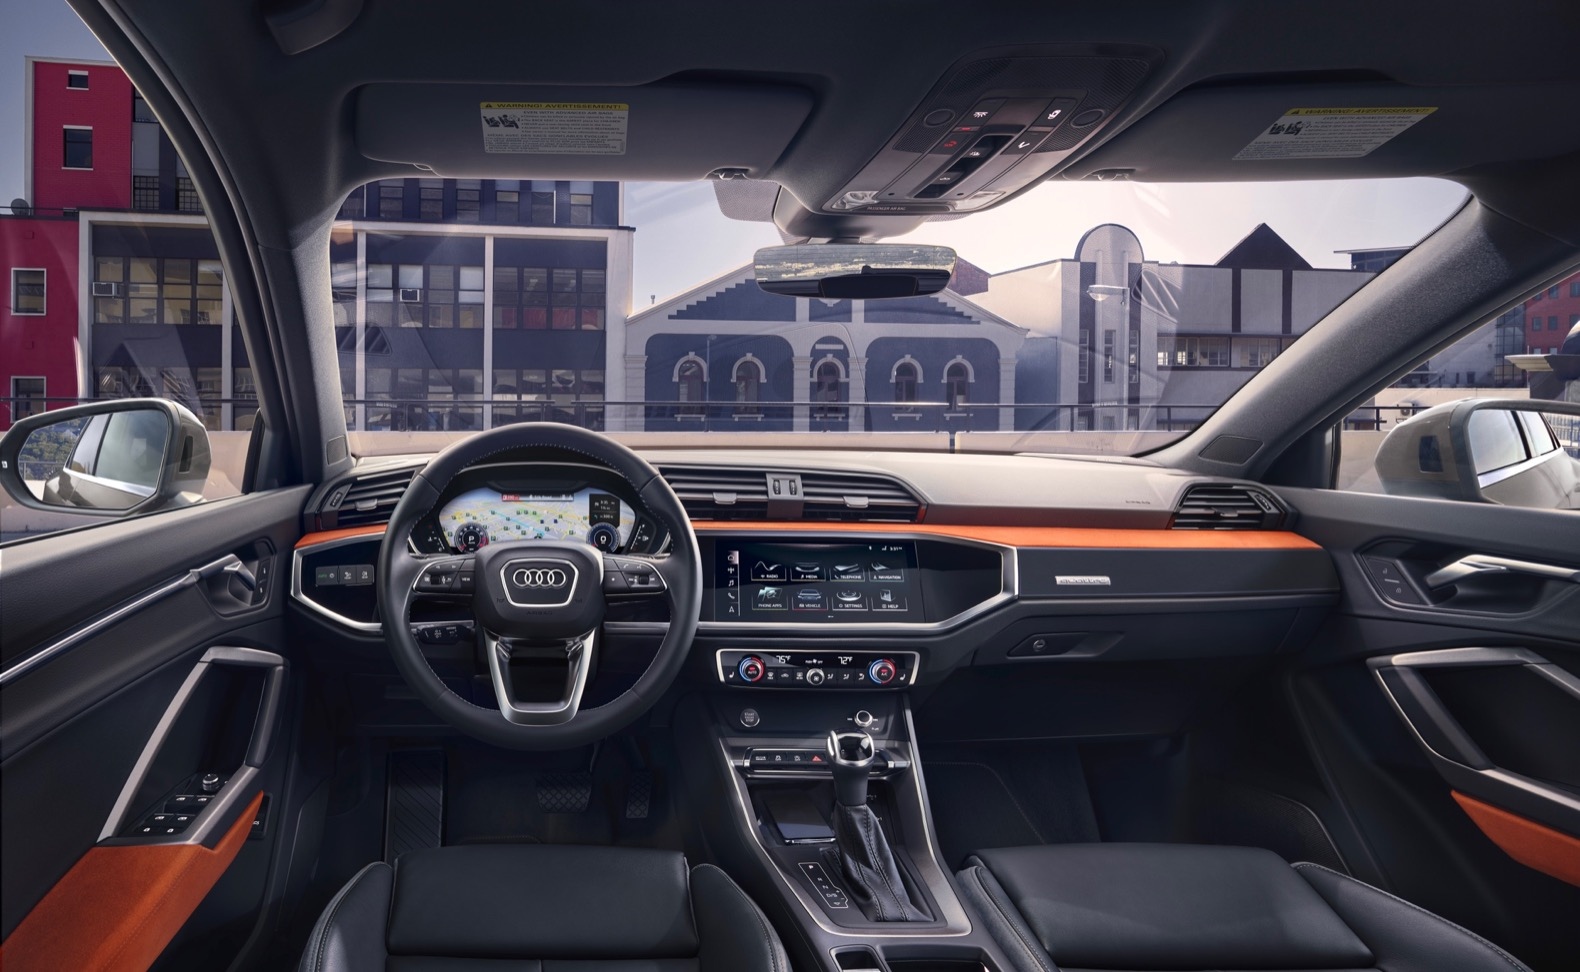 2019 Audi Q3 Priced At 35695 The Torque Report